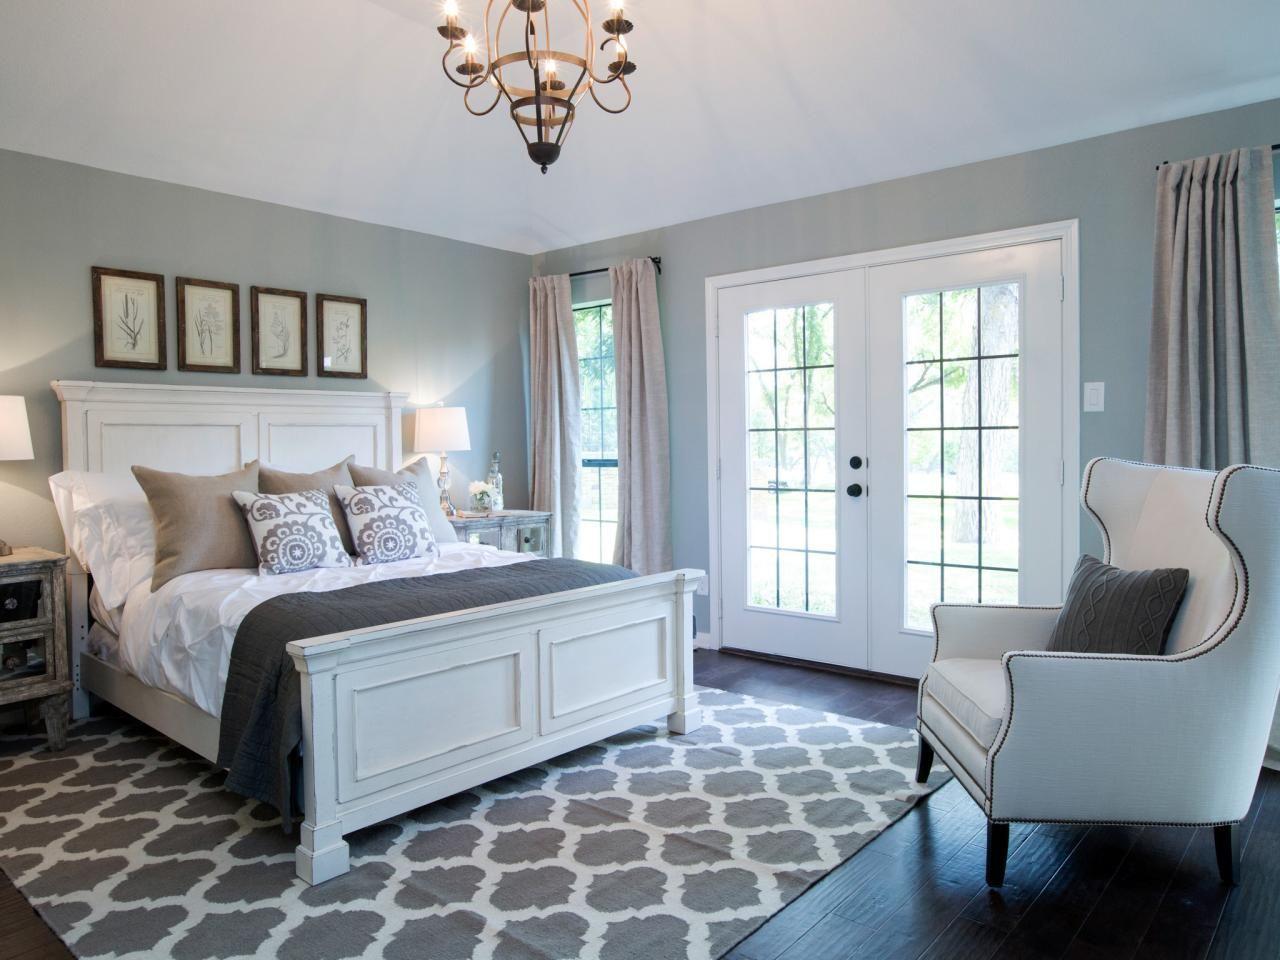 2019 Master Bedroom Decor Ideas Pinterest Best Paint For Interior Check More At Http Www Soar Relaxing Master Bedroom Remodel Bedroom Master Bedrooms Decor